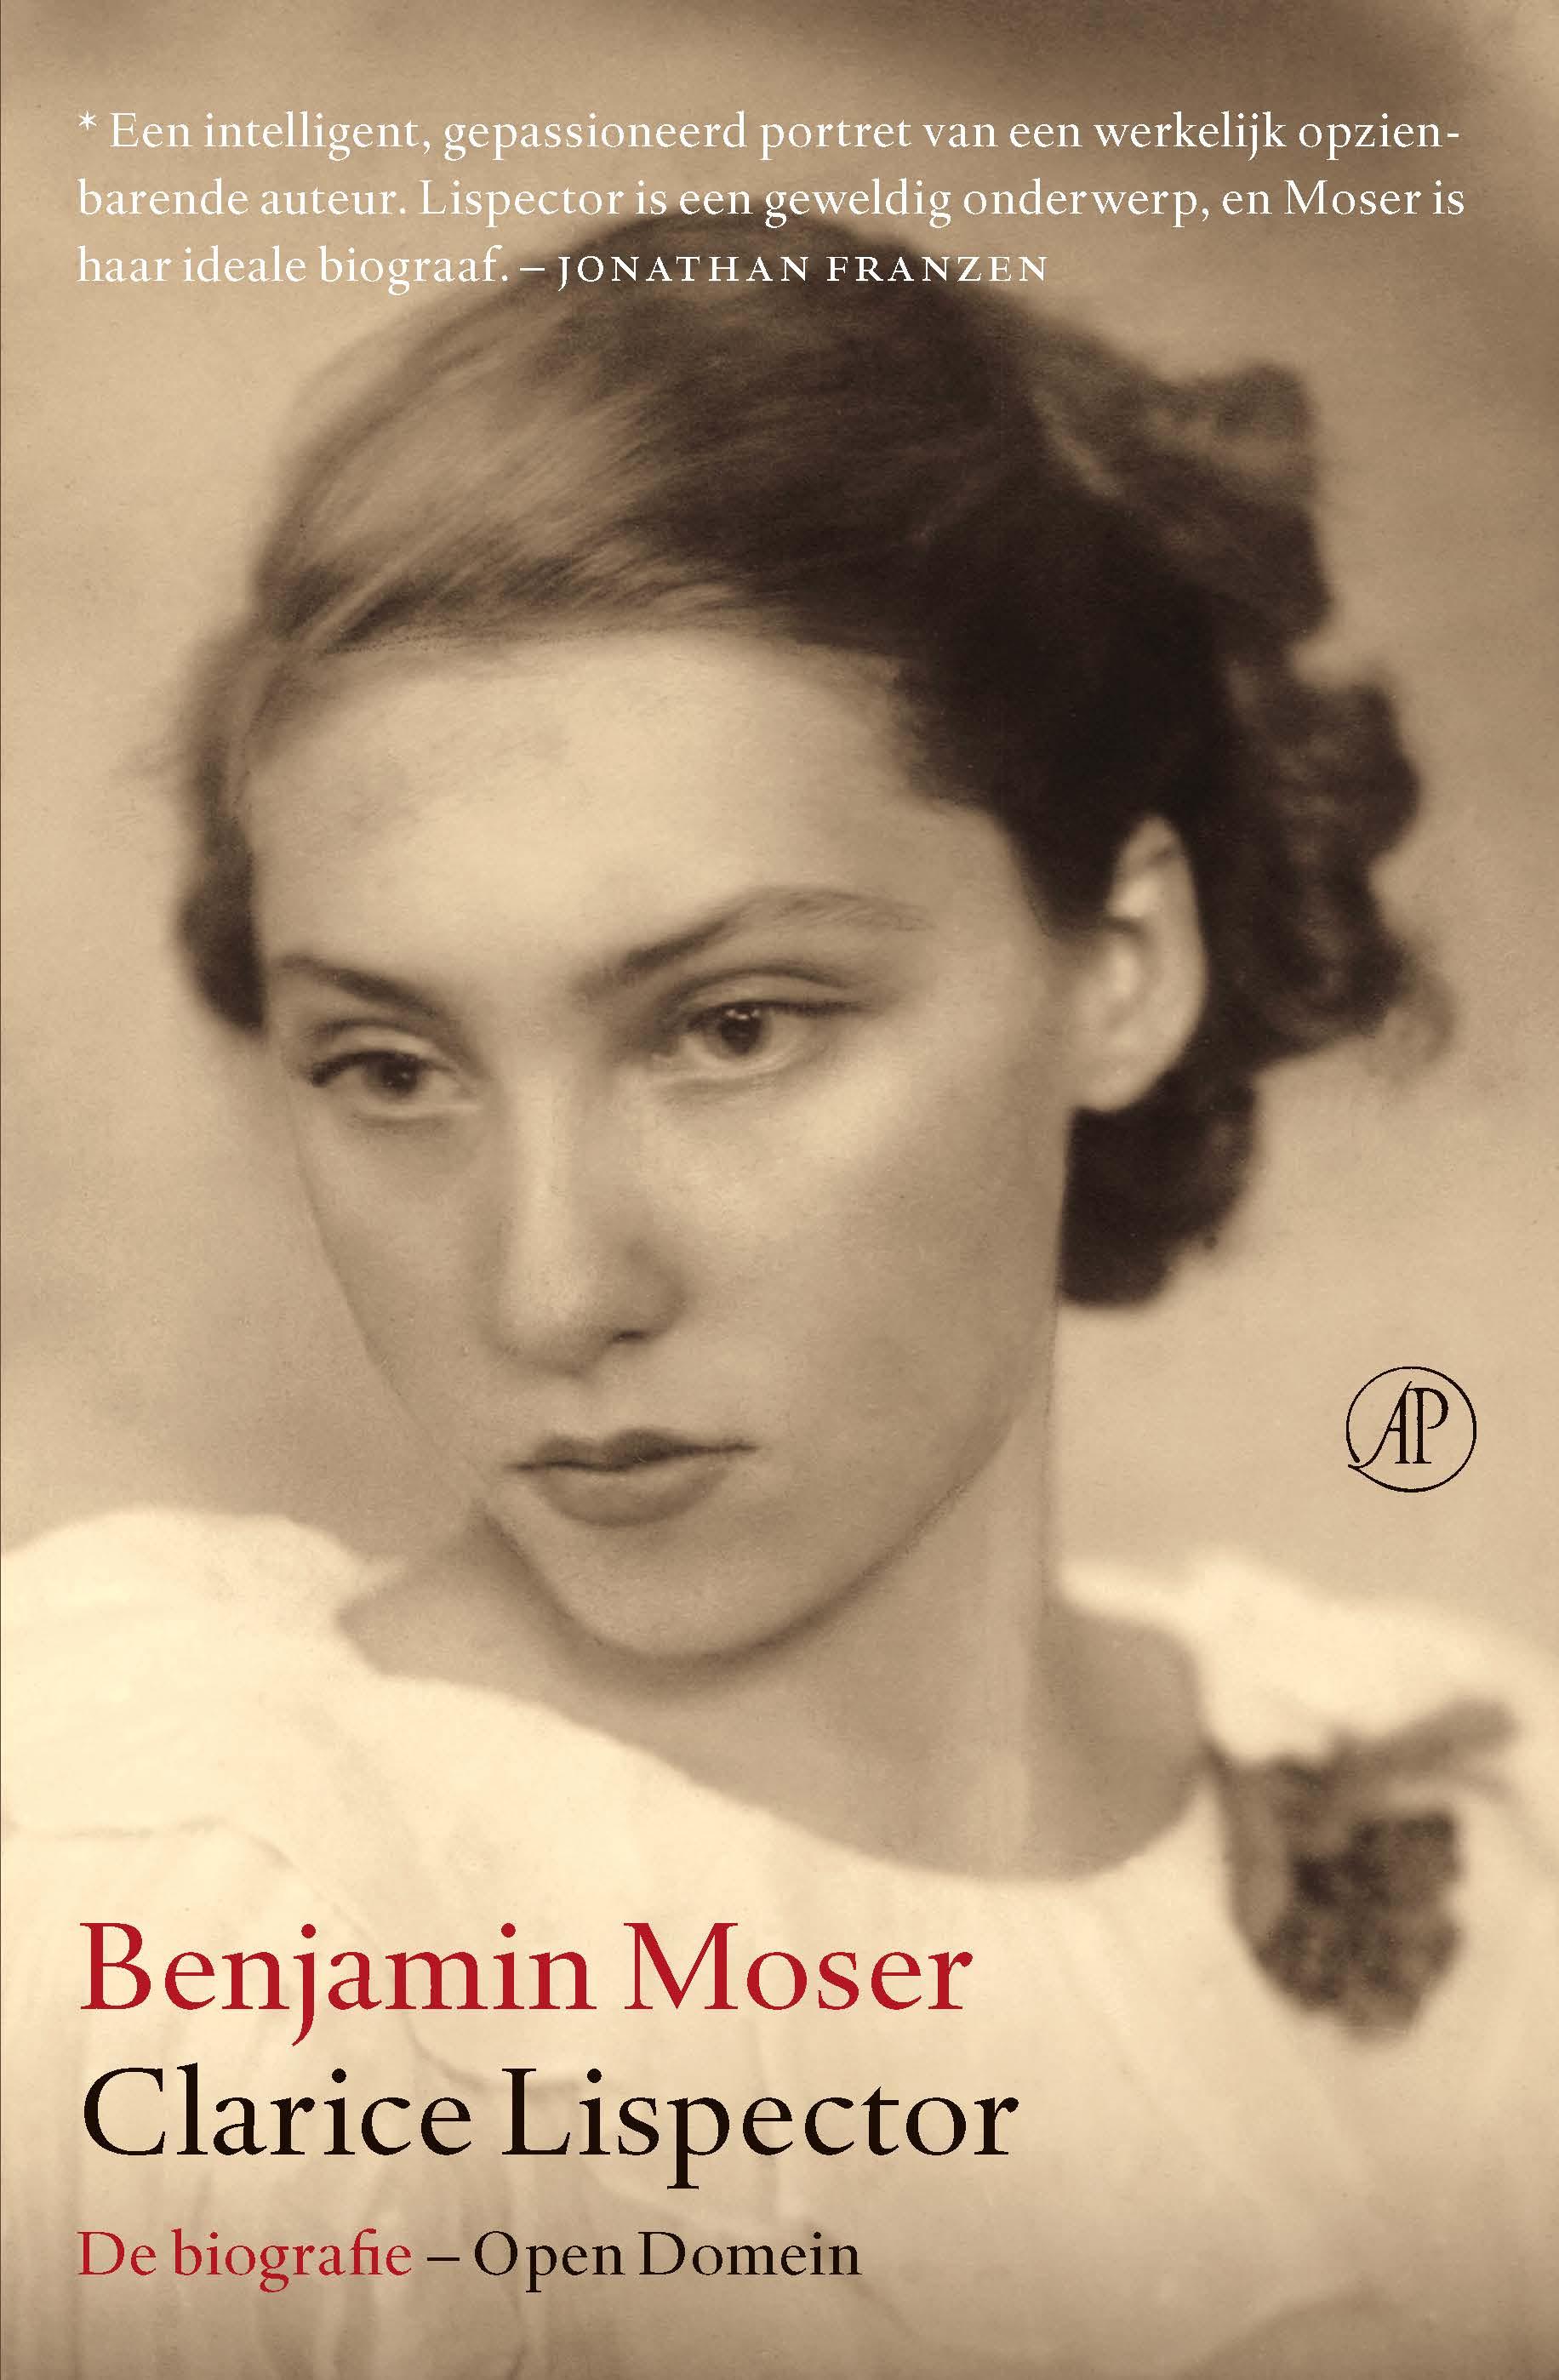 Clarice Lispector – Benjamin Moser